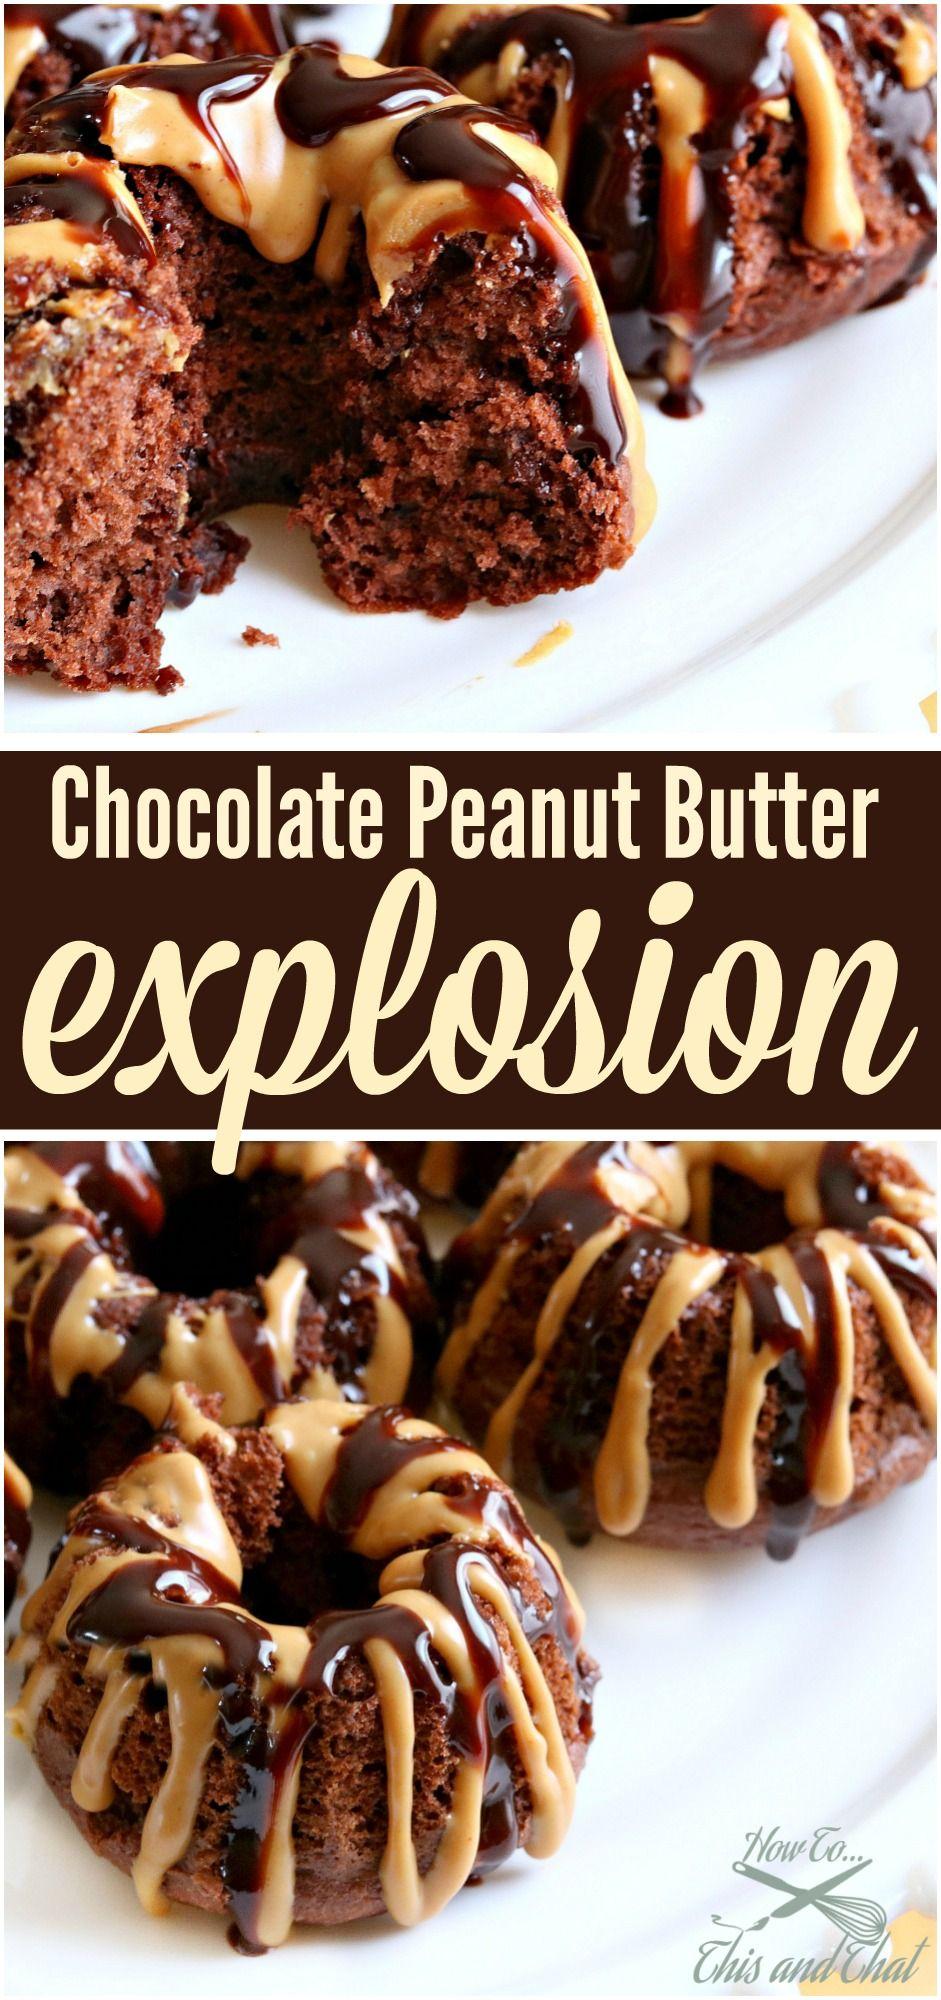 Chocolate Peanut Butter Explosion Bundt Cakes